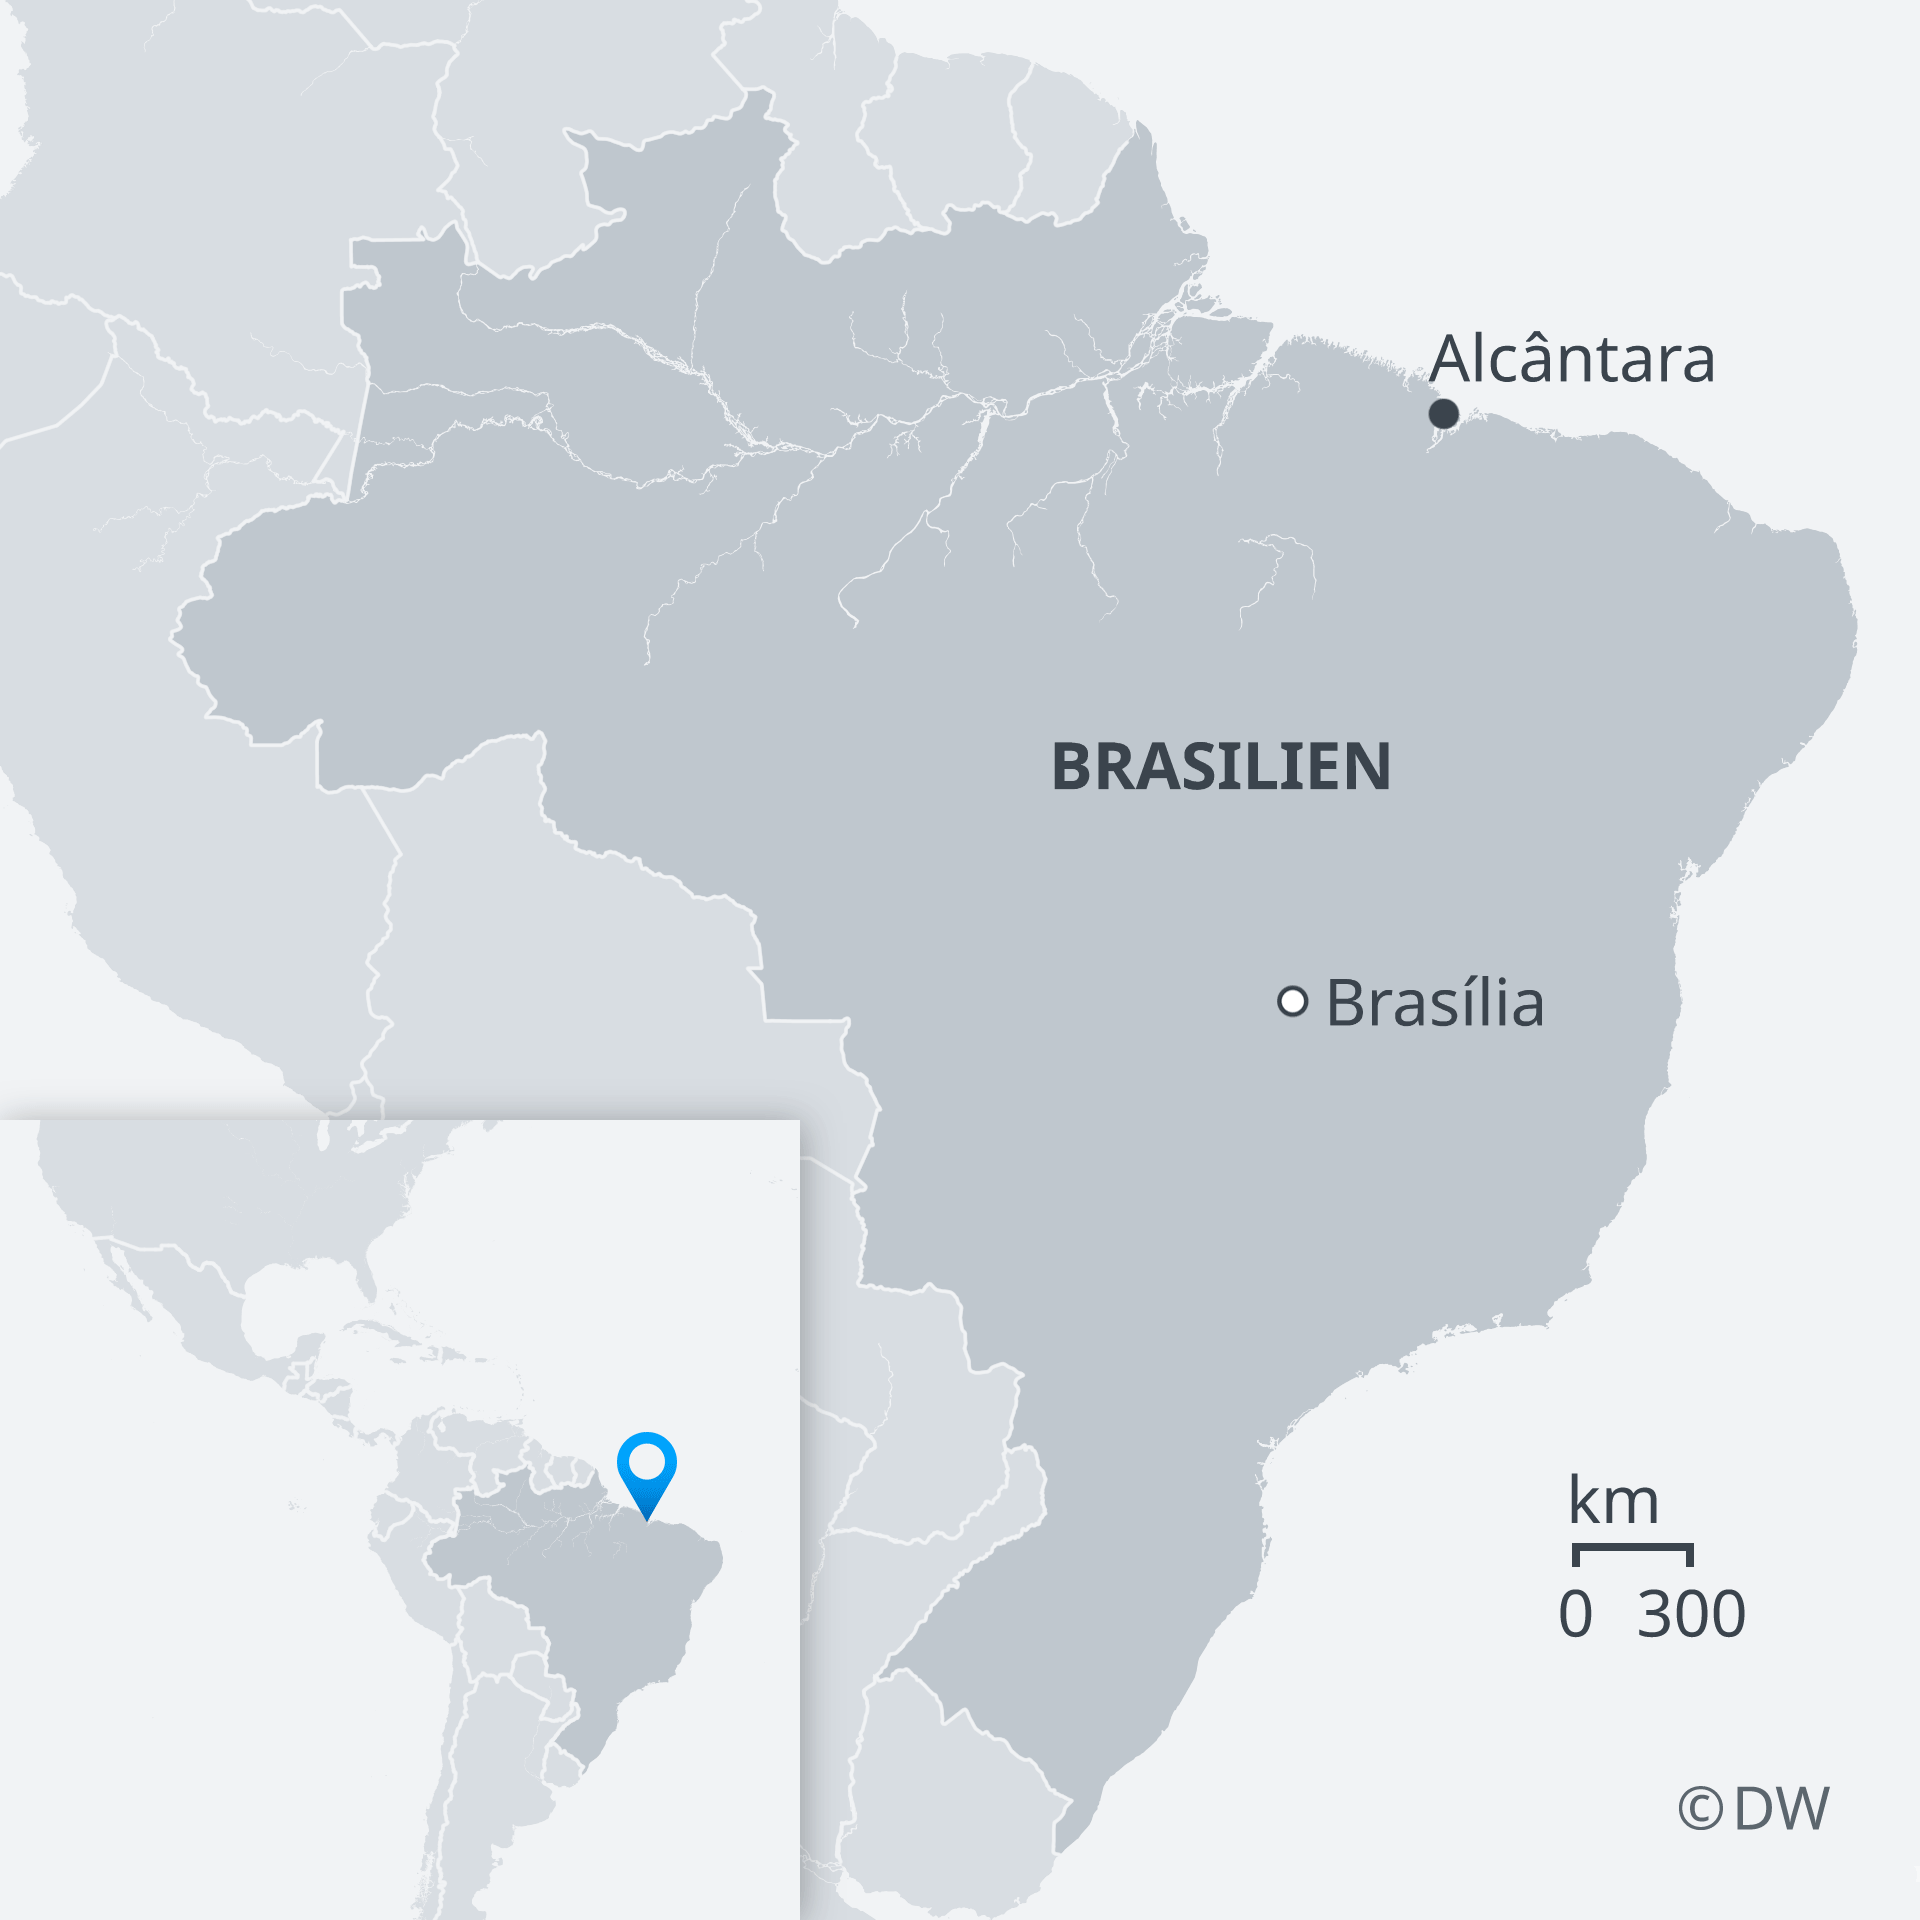 Karte Norwegen D303244nemark.Brasilien Karte Aquator